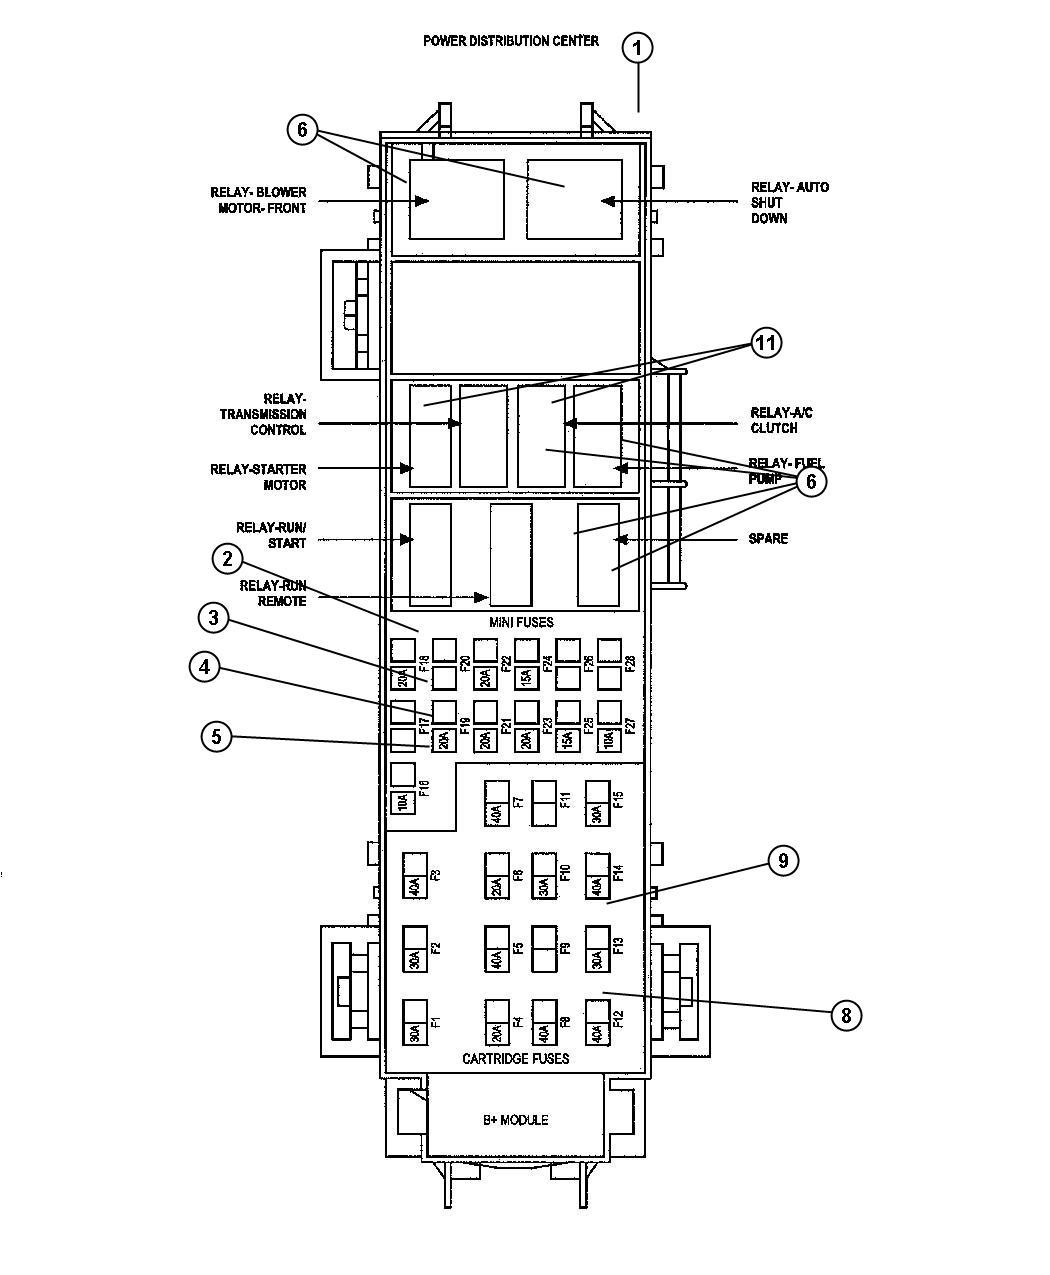 Dodge Durango Power Distribution Center